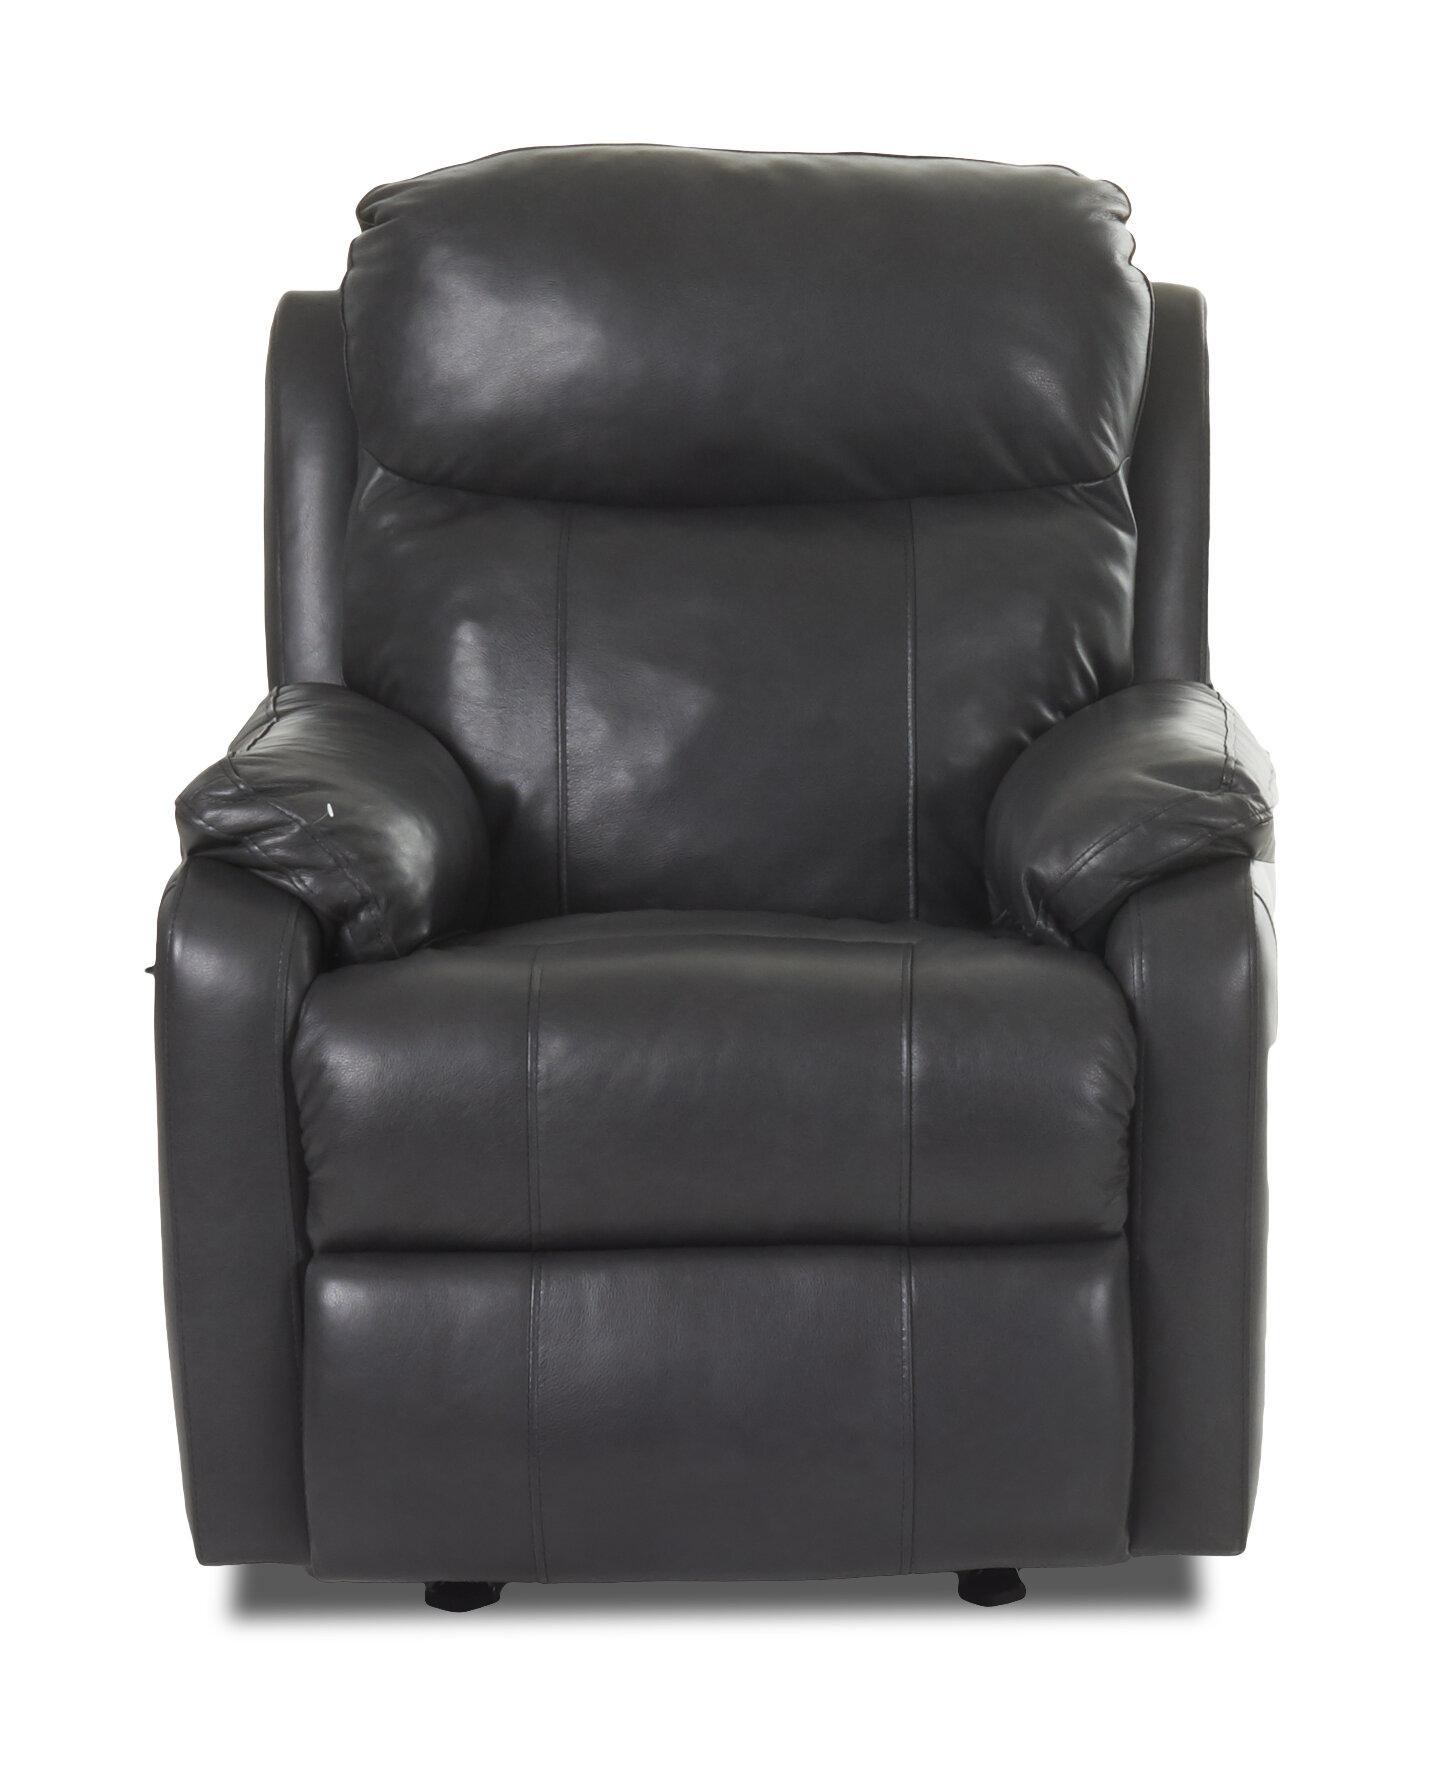 Red Barrel Studio Torrance Foam Seat Cushion Recliner With